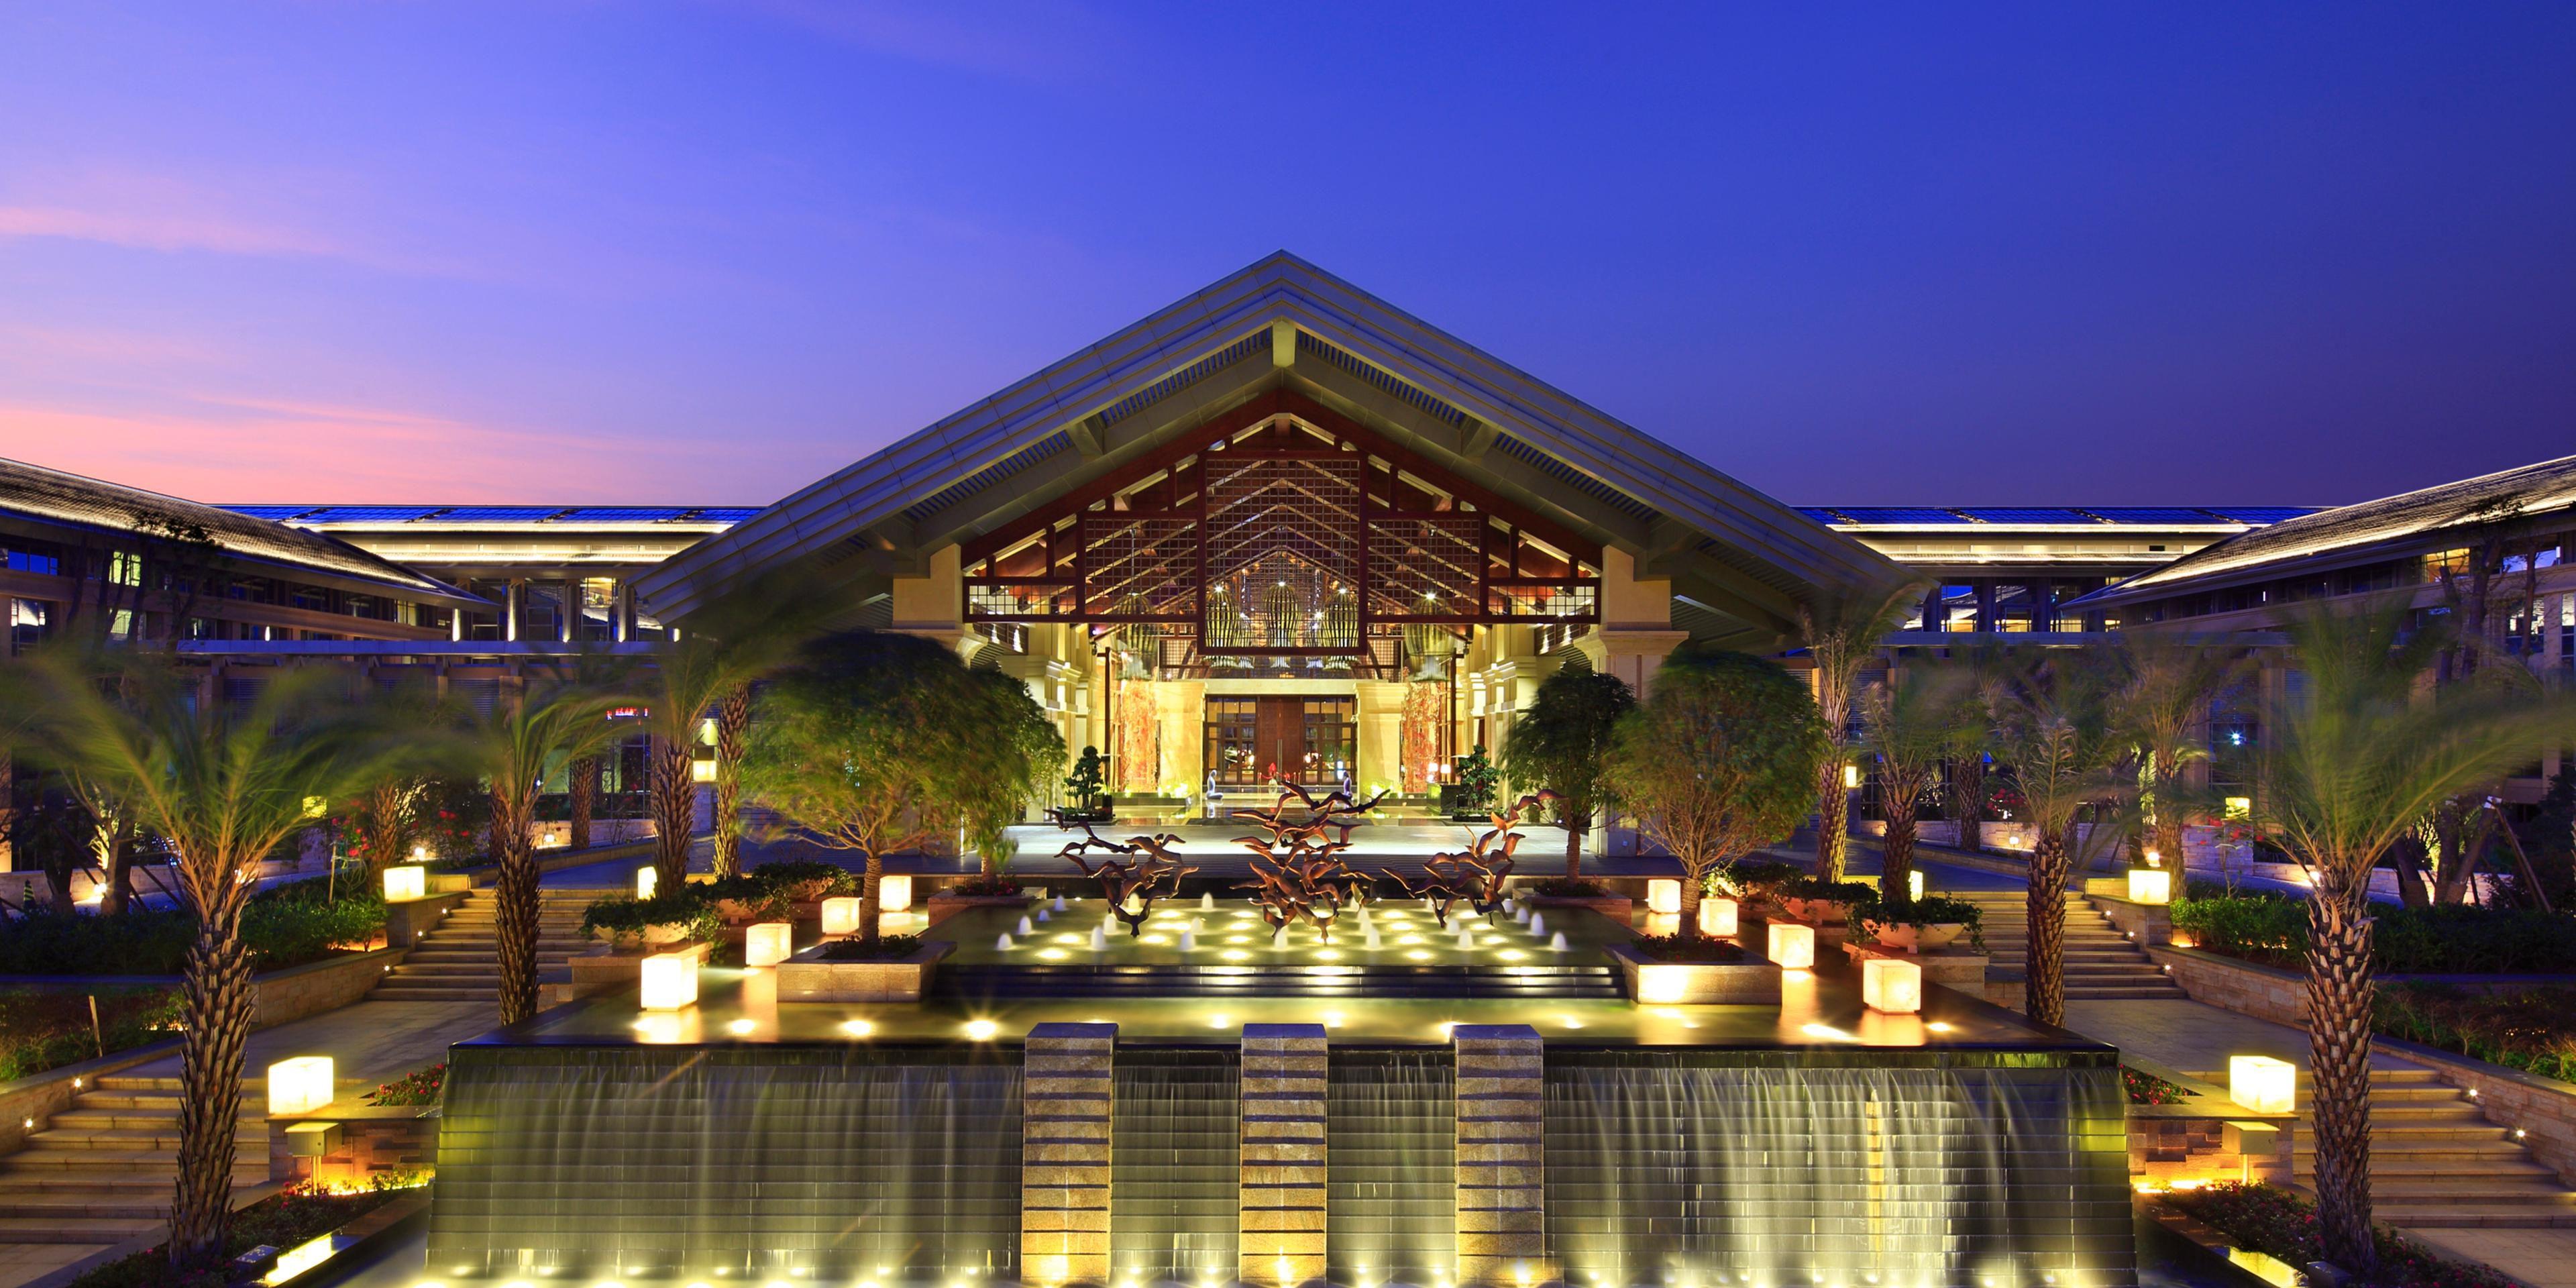 kunming hotels intercontinental kunming hotel in kunming china rh ihg com